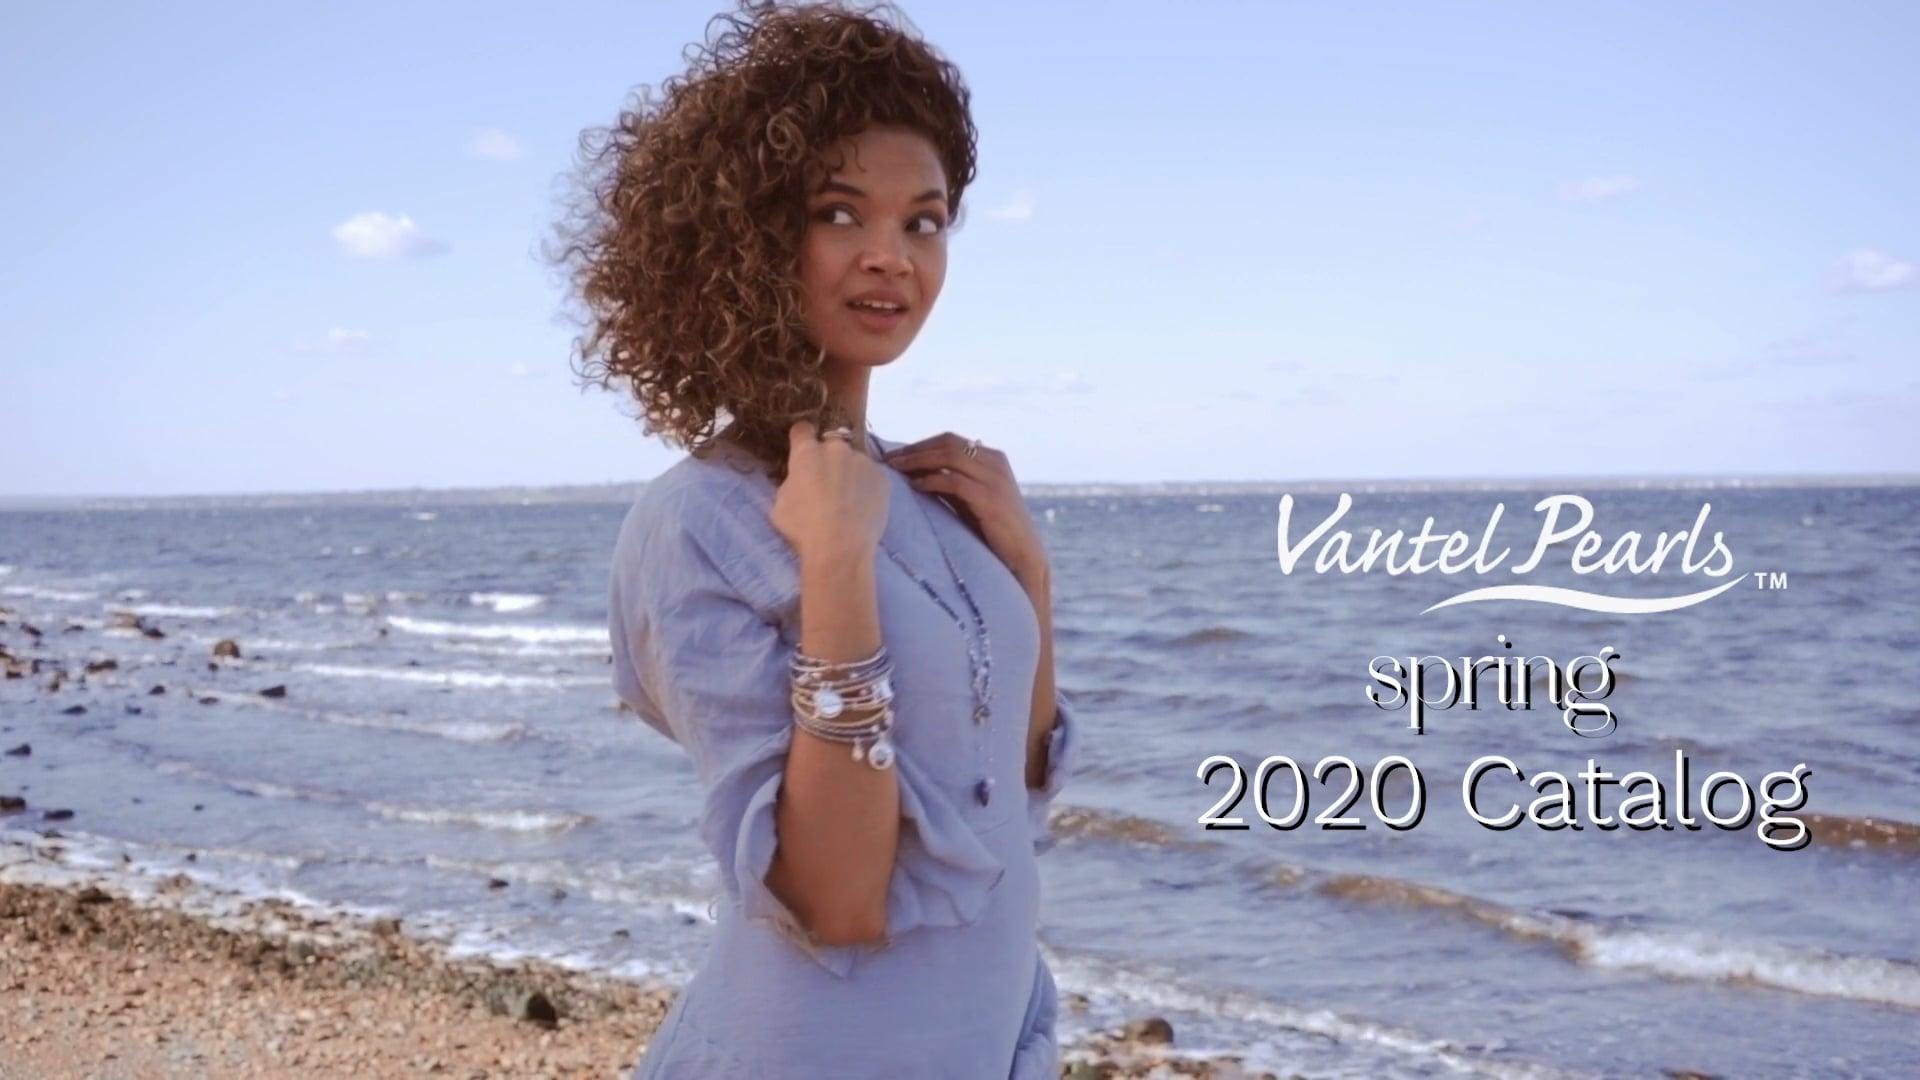 Vantel Pearls - 2020 Spring Catalog